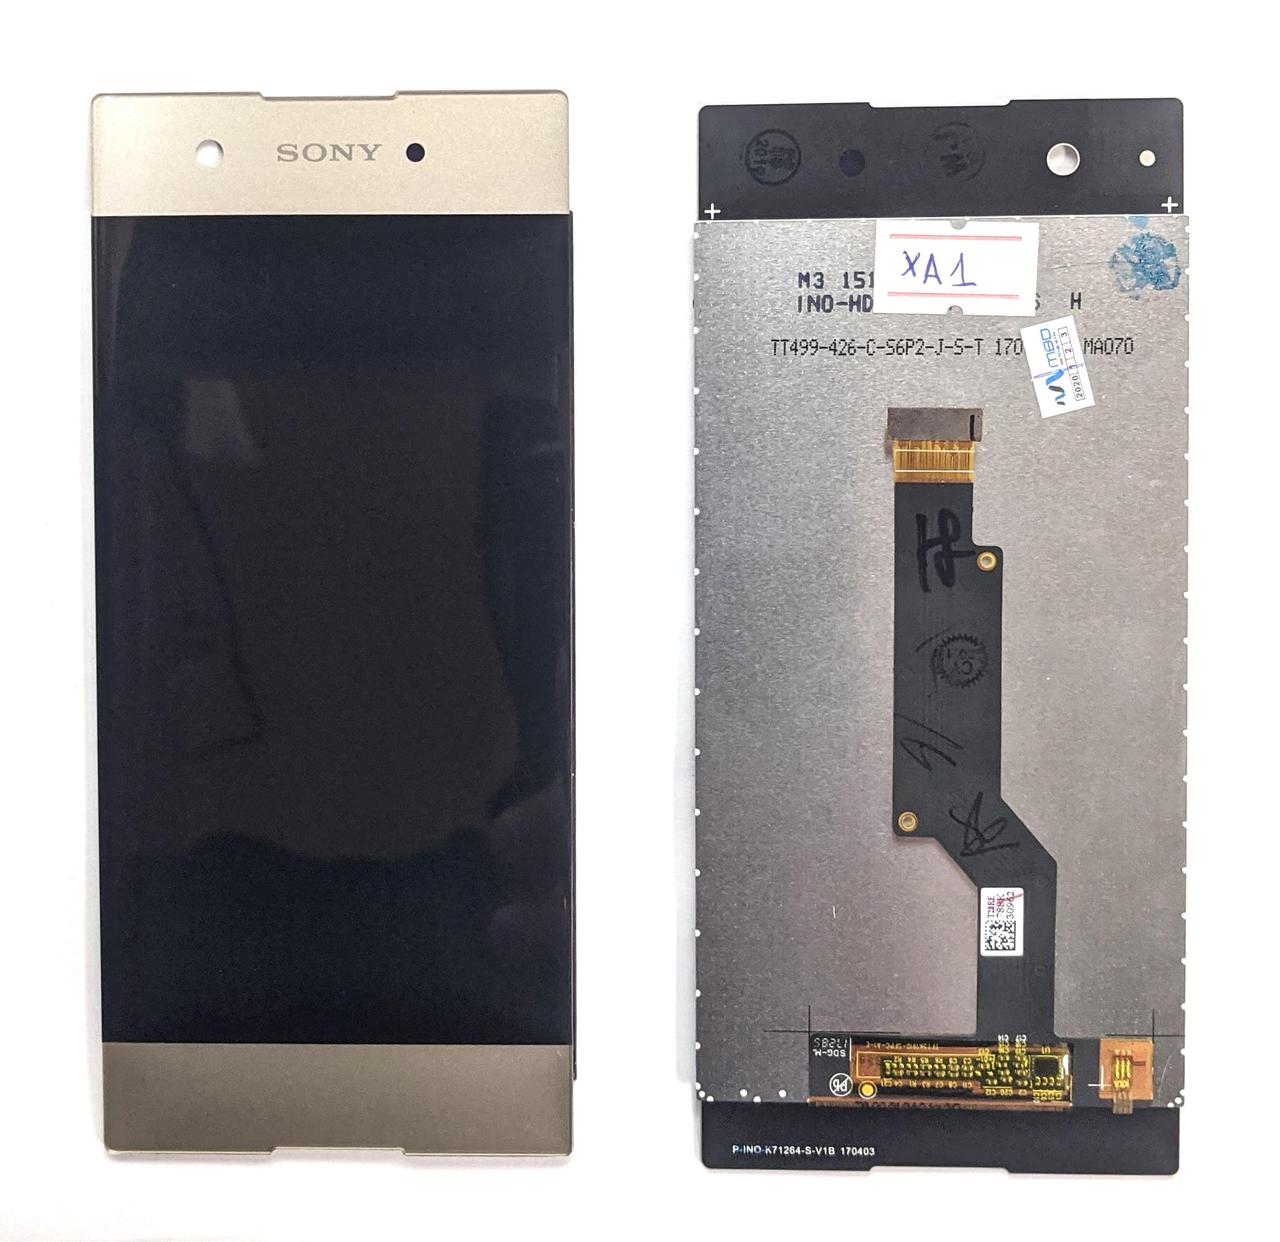 Модуль Sony Xperia XA1 Dual G3112 G3116 G3121 G3123 G3125 Golg Дисплей + сенсор